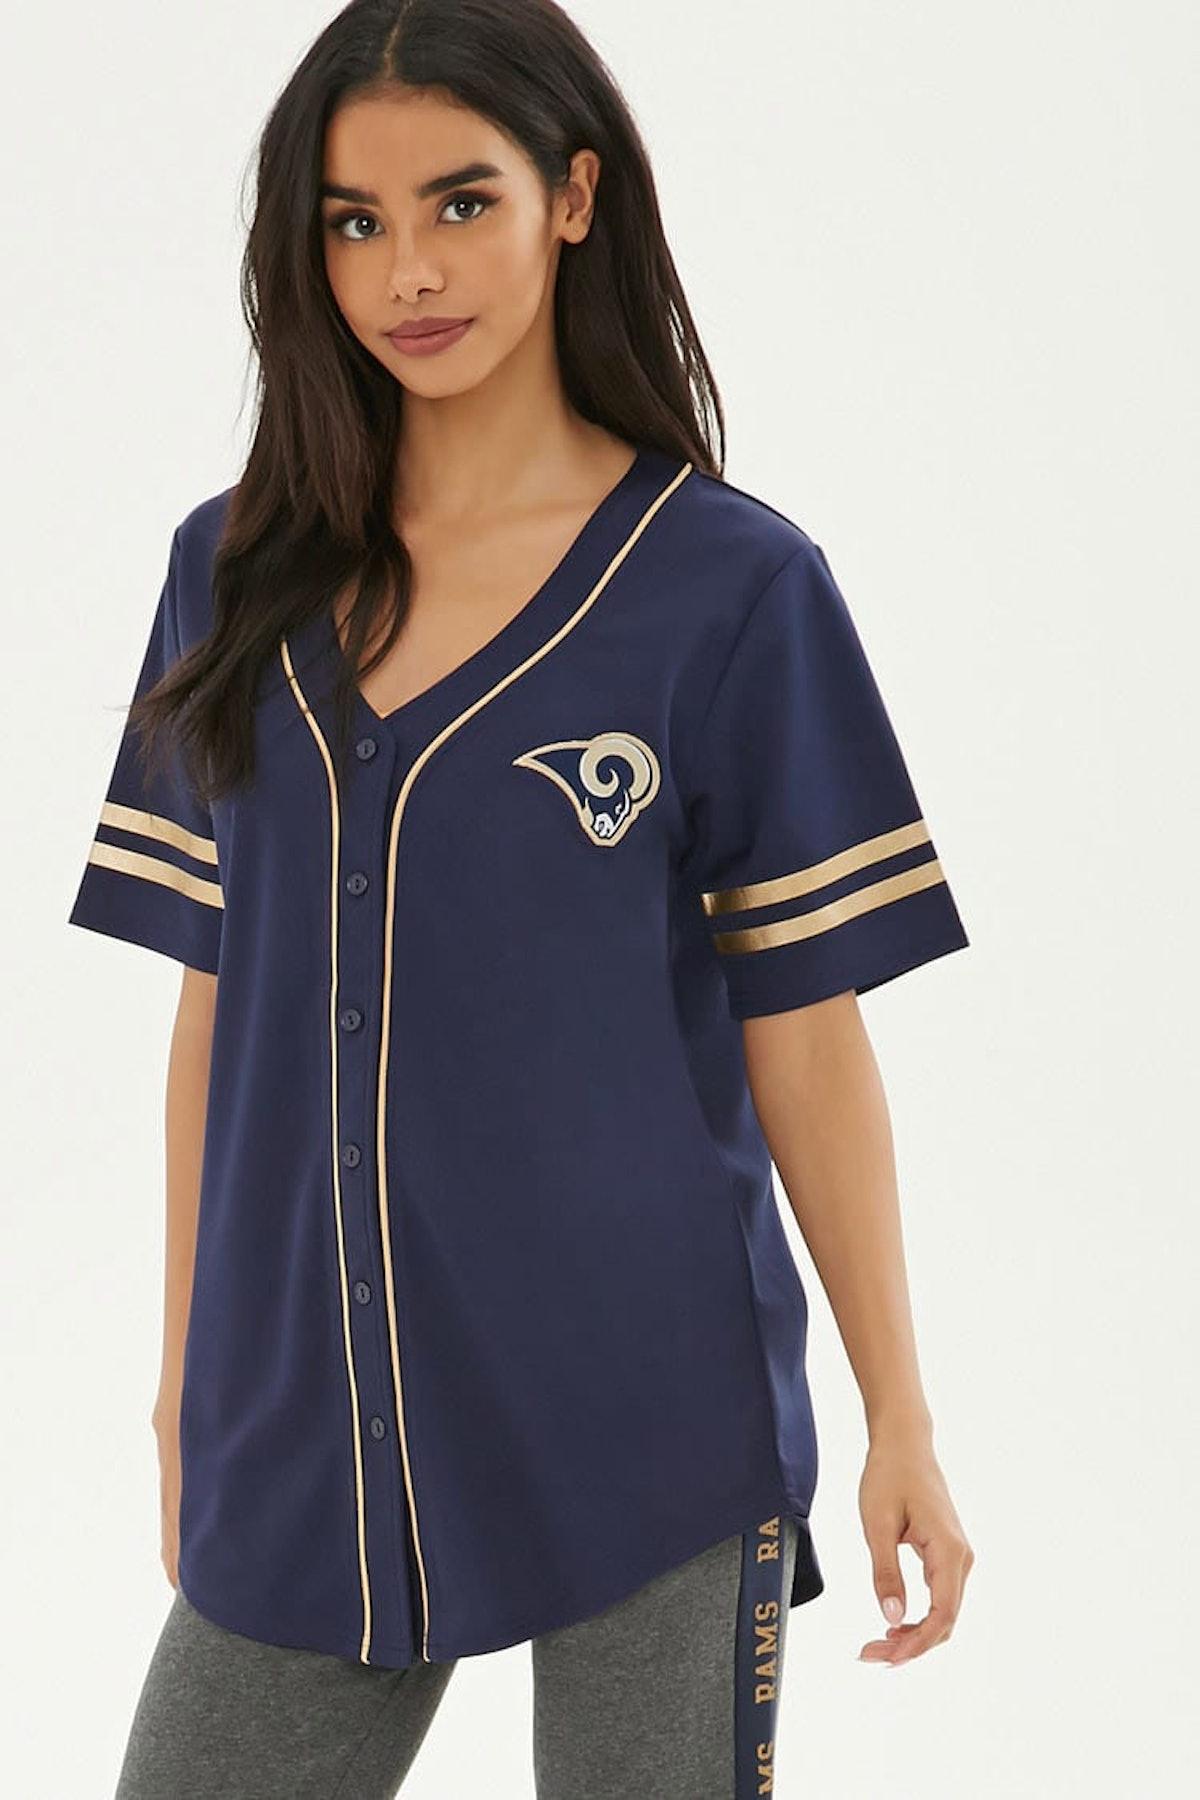 NFL Rams Baseball Jersey